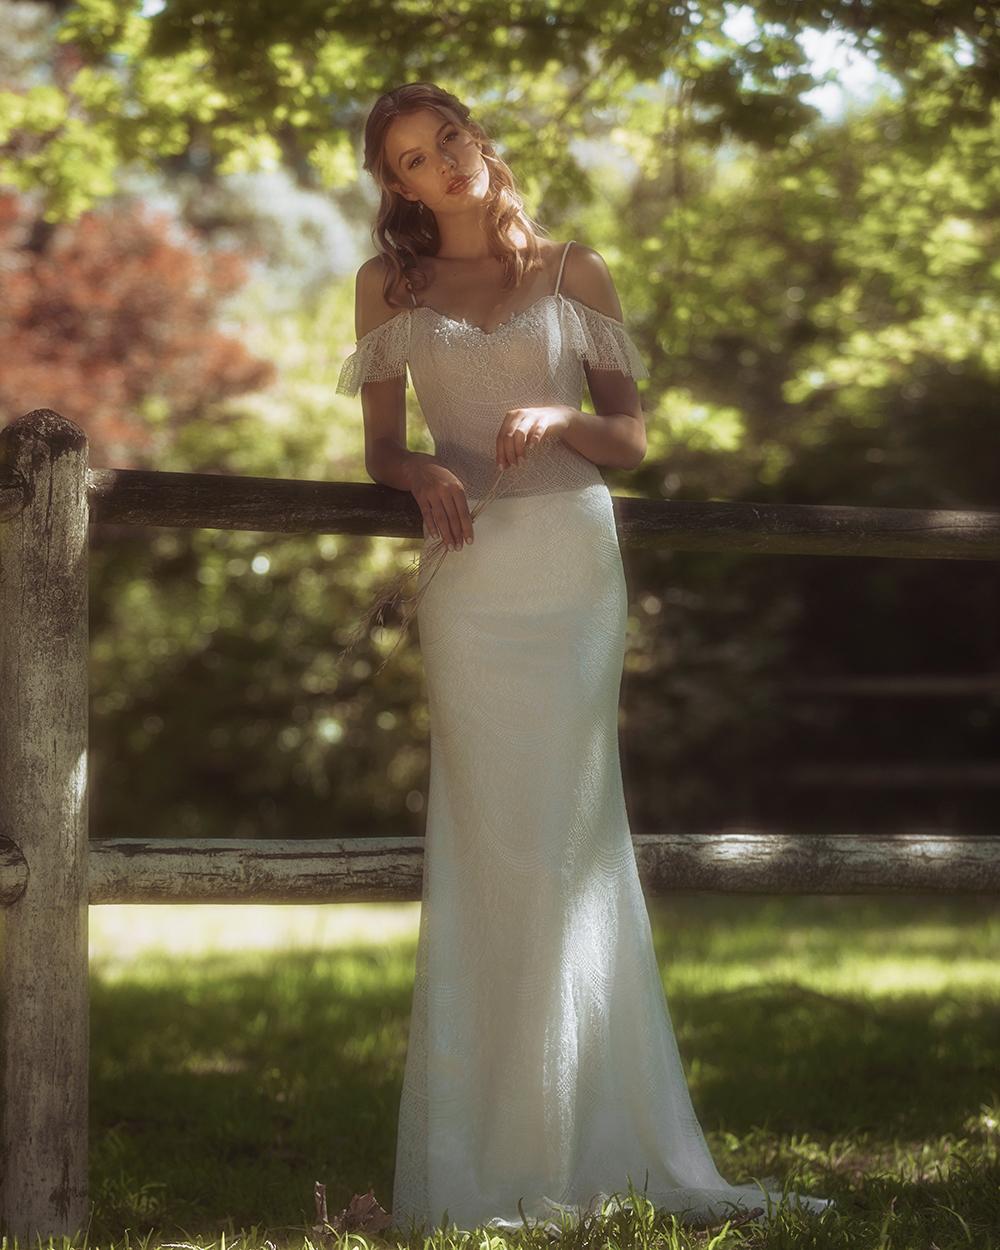 Elbeth Gillis - Desire Collection - Adeline with sleeves